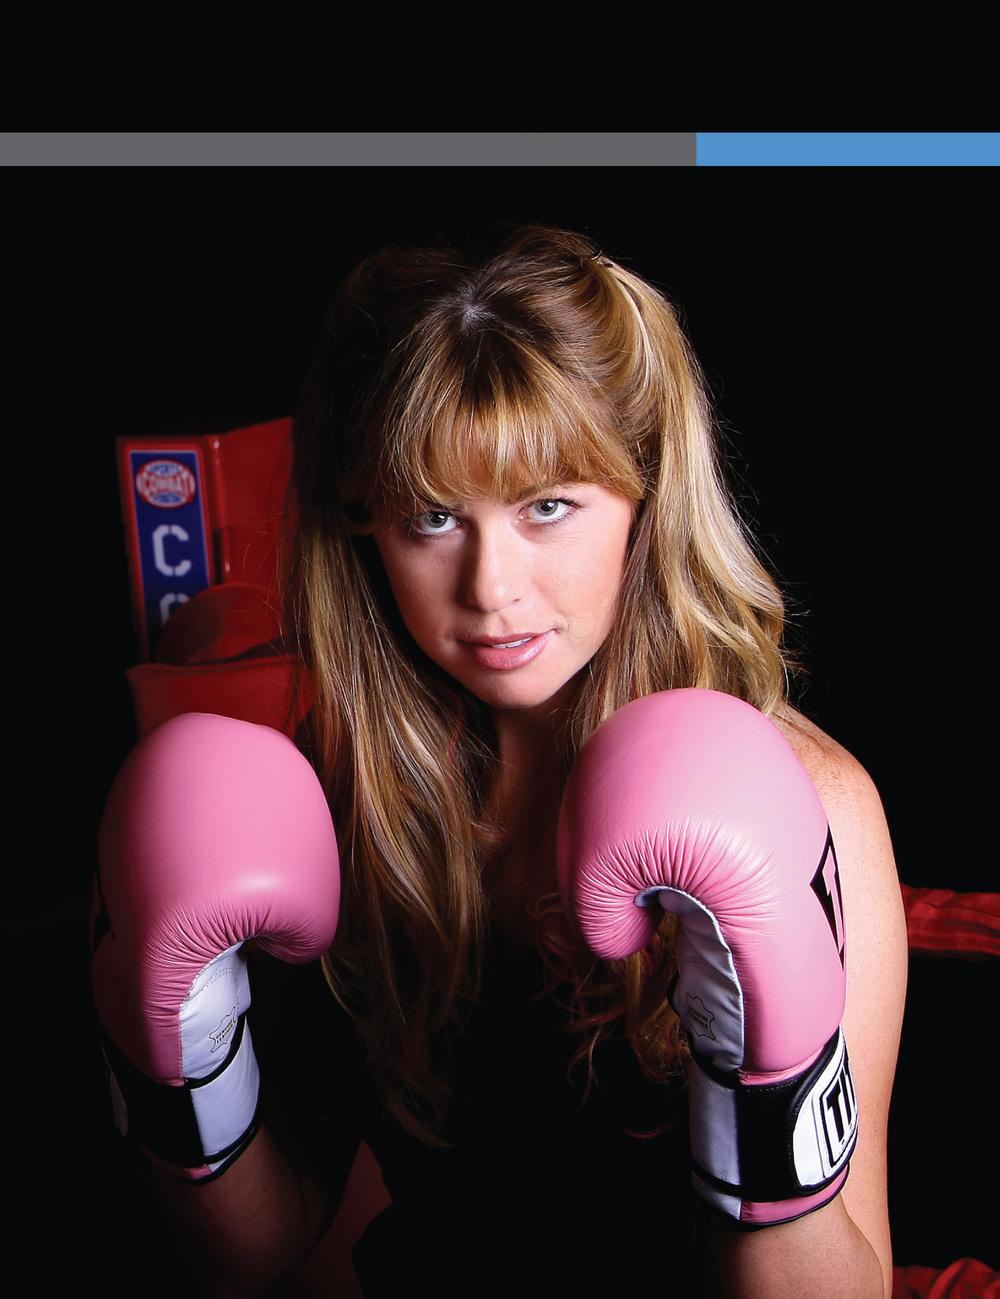 Paula-Creamer-Pink-knockout.jpg